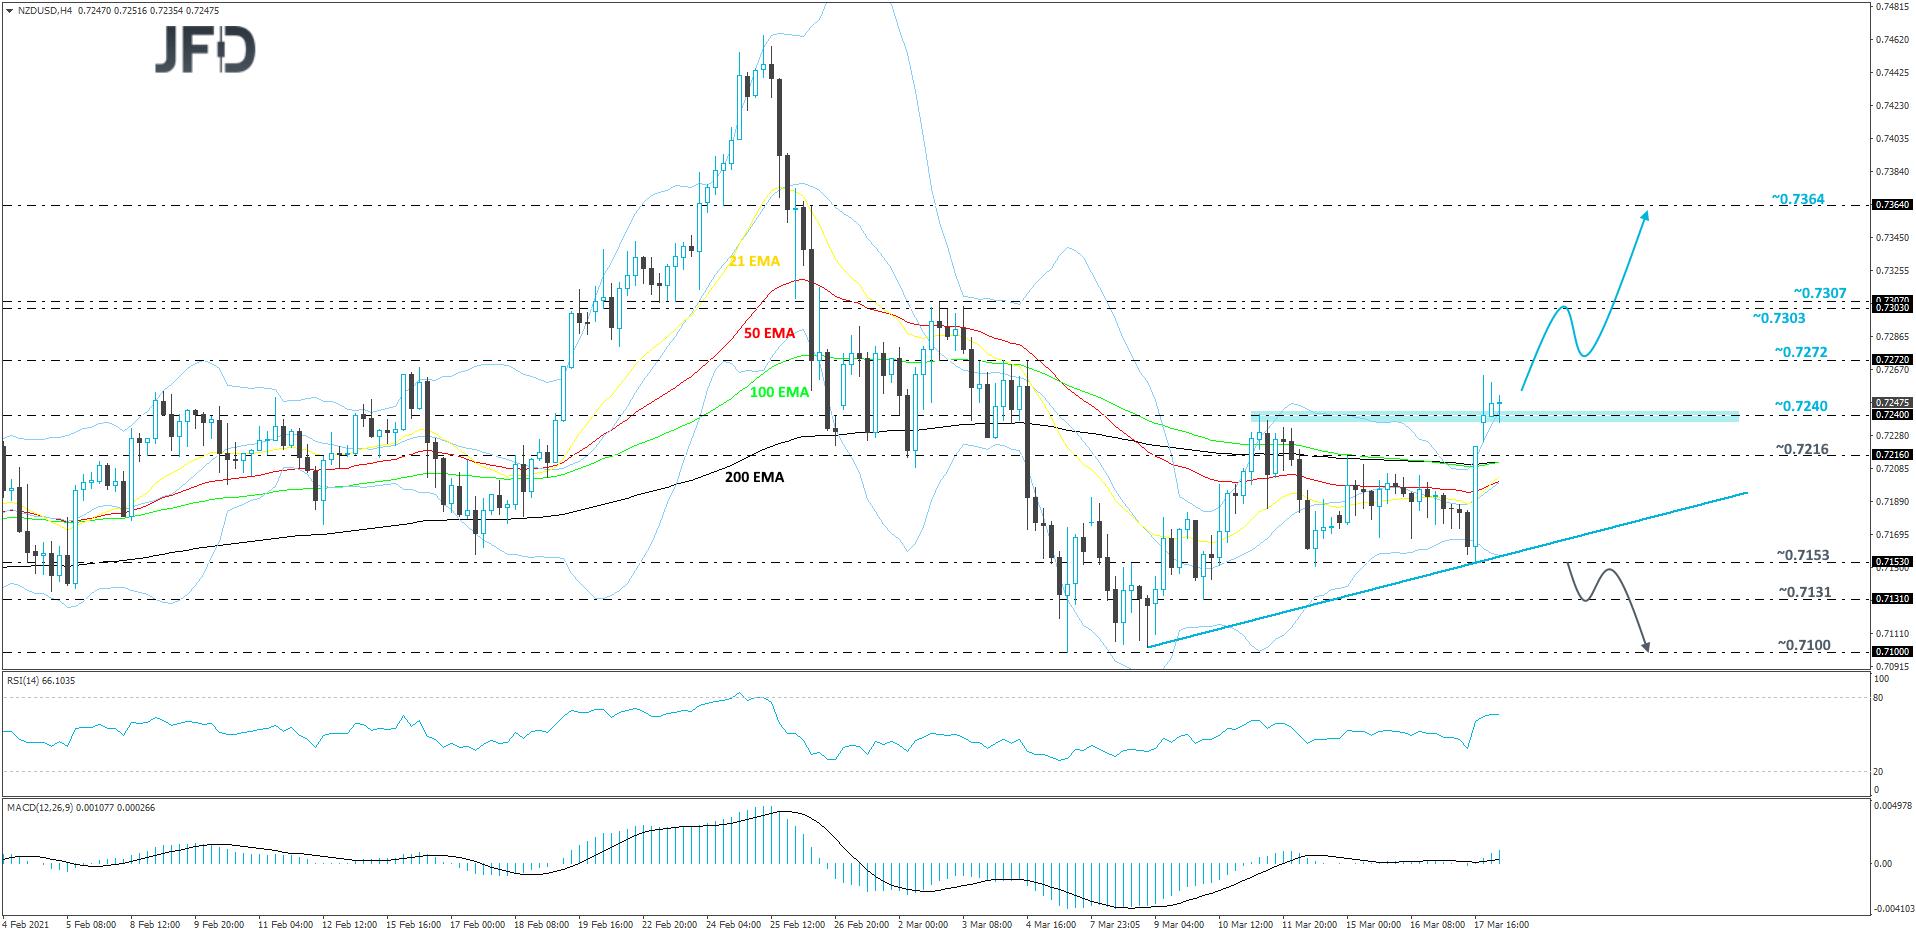 NZD/USD 4-hour chart technical analysis